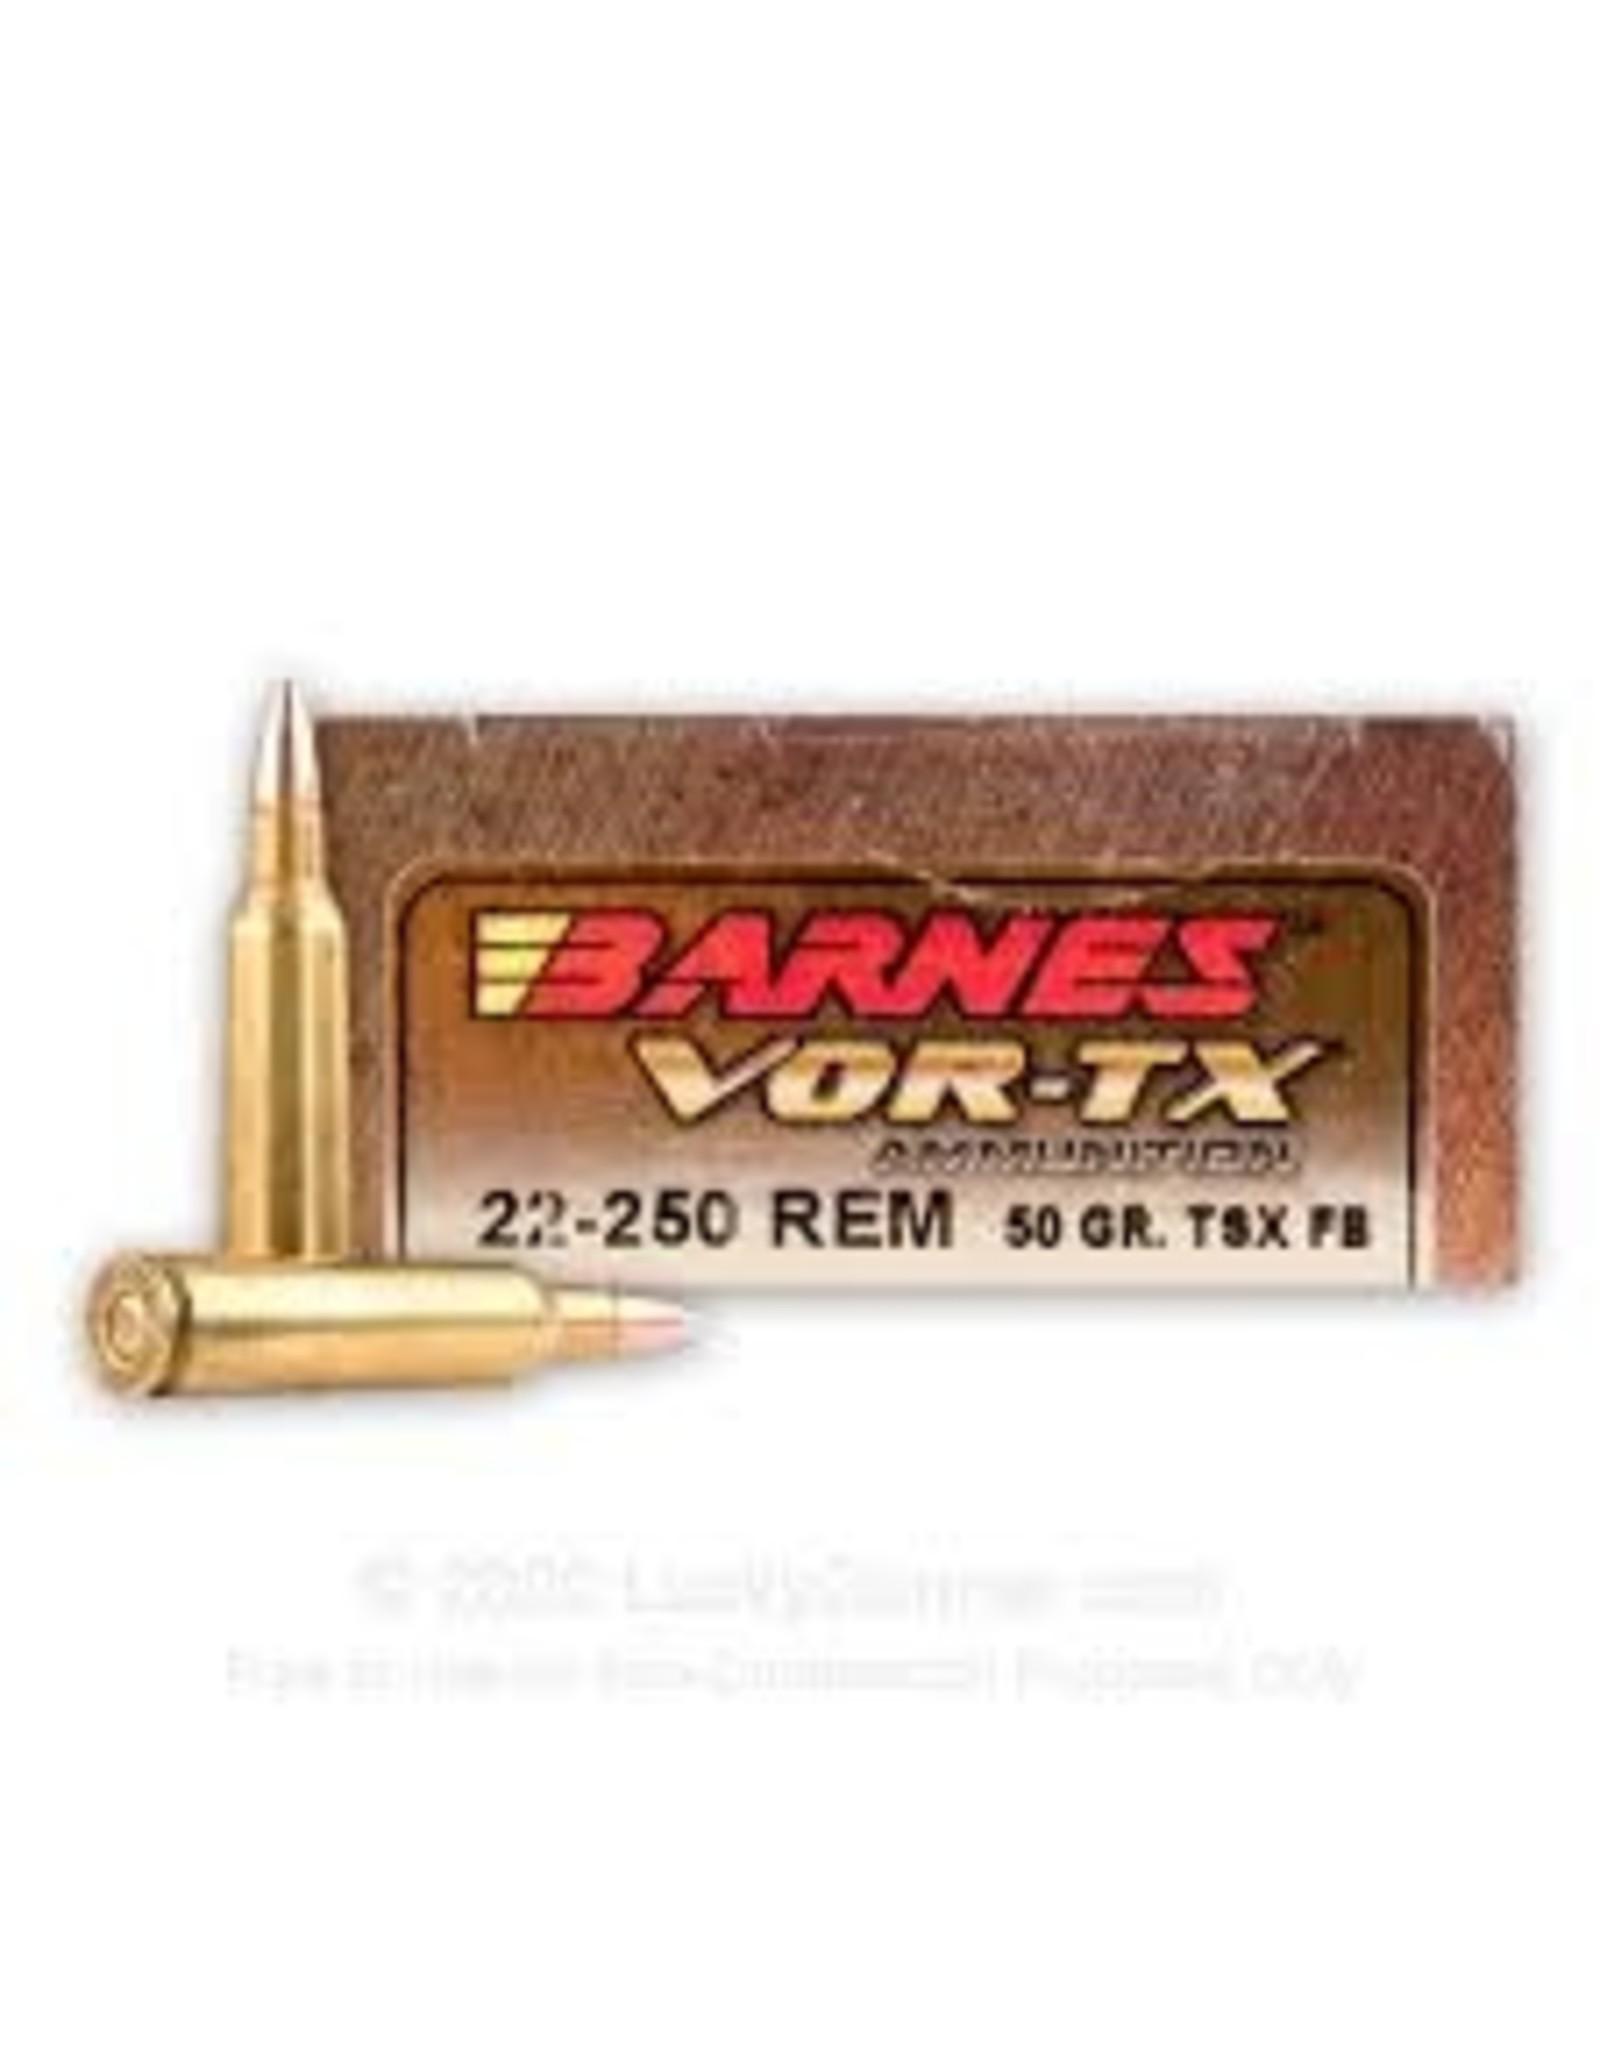 Barnes Barnes VOR-TX Rifle Ammo 22-250 REM, TSX FB, 50 Grains, 3830 fps